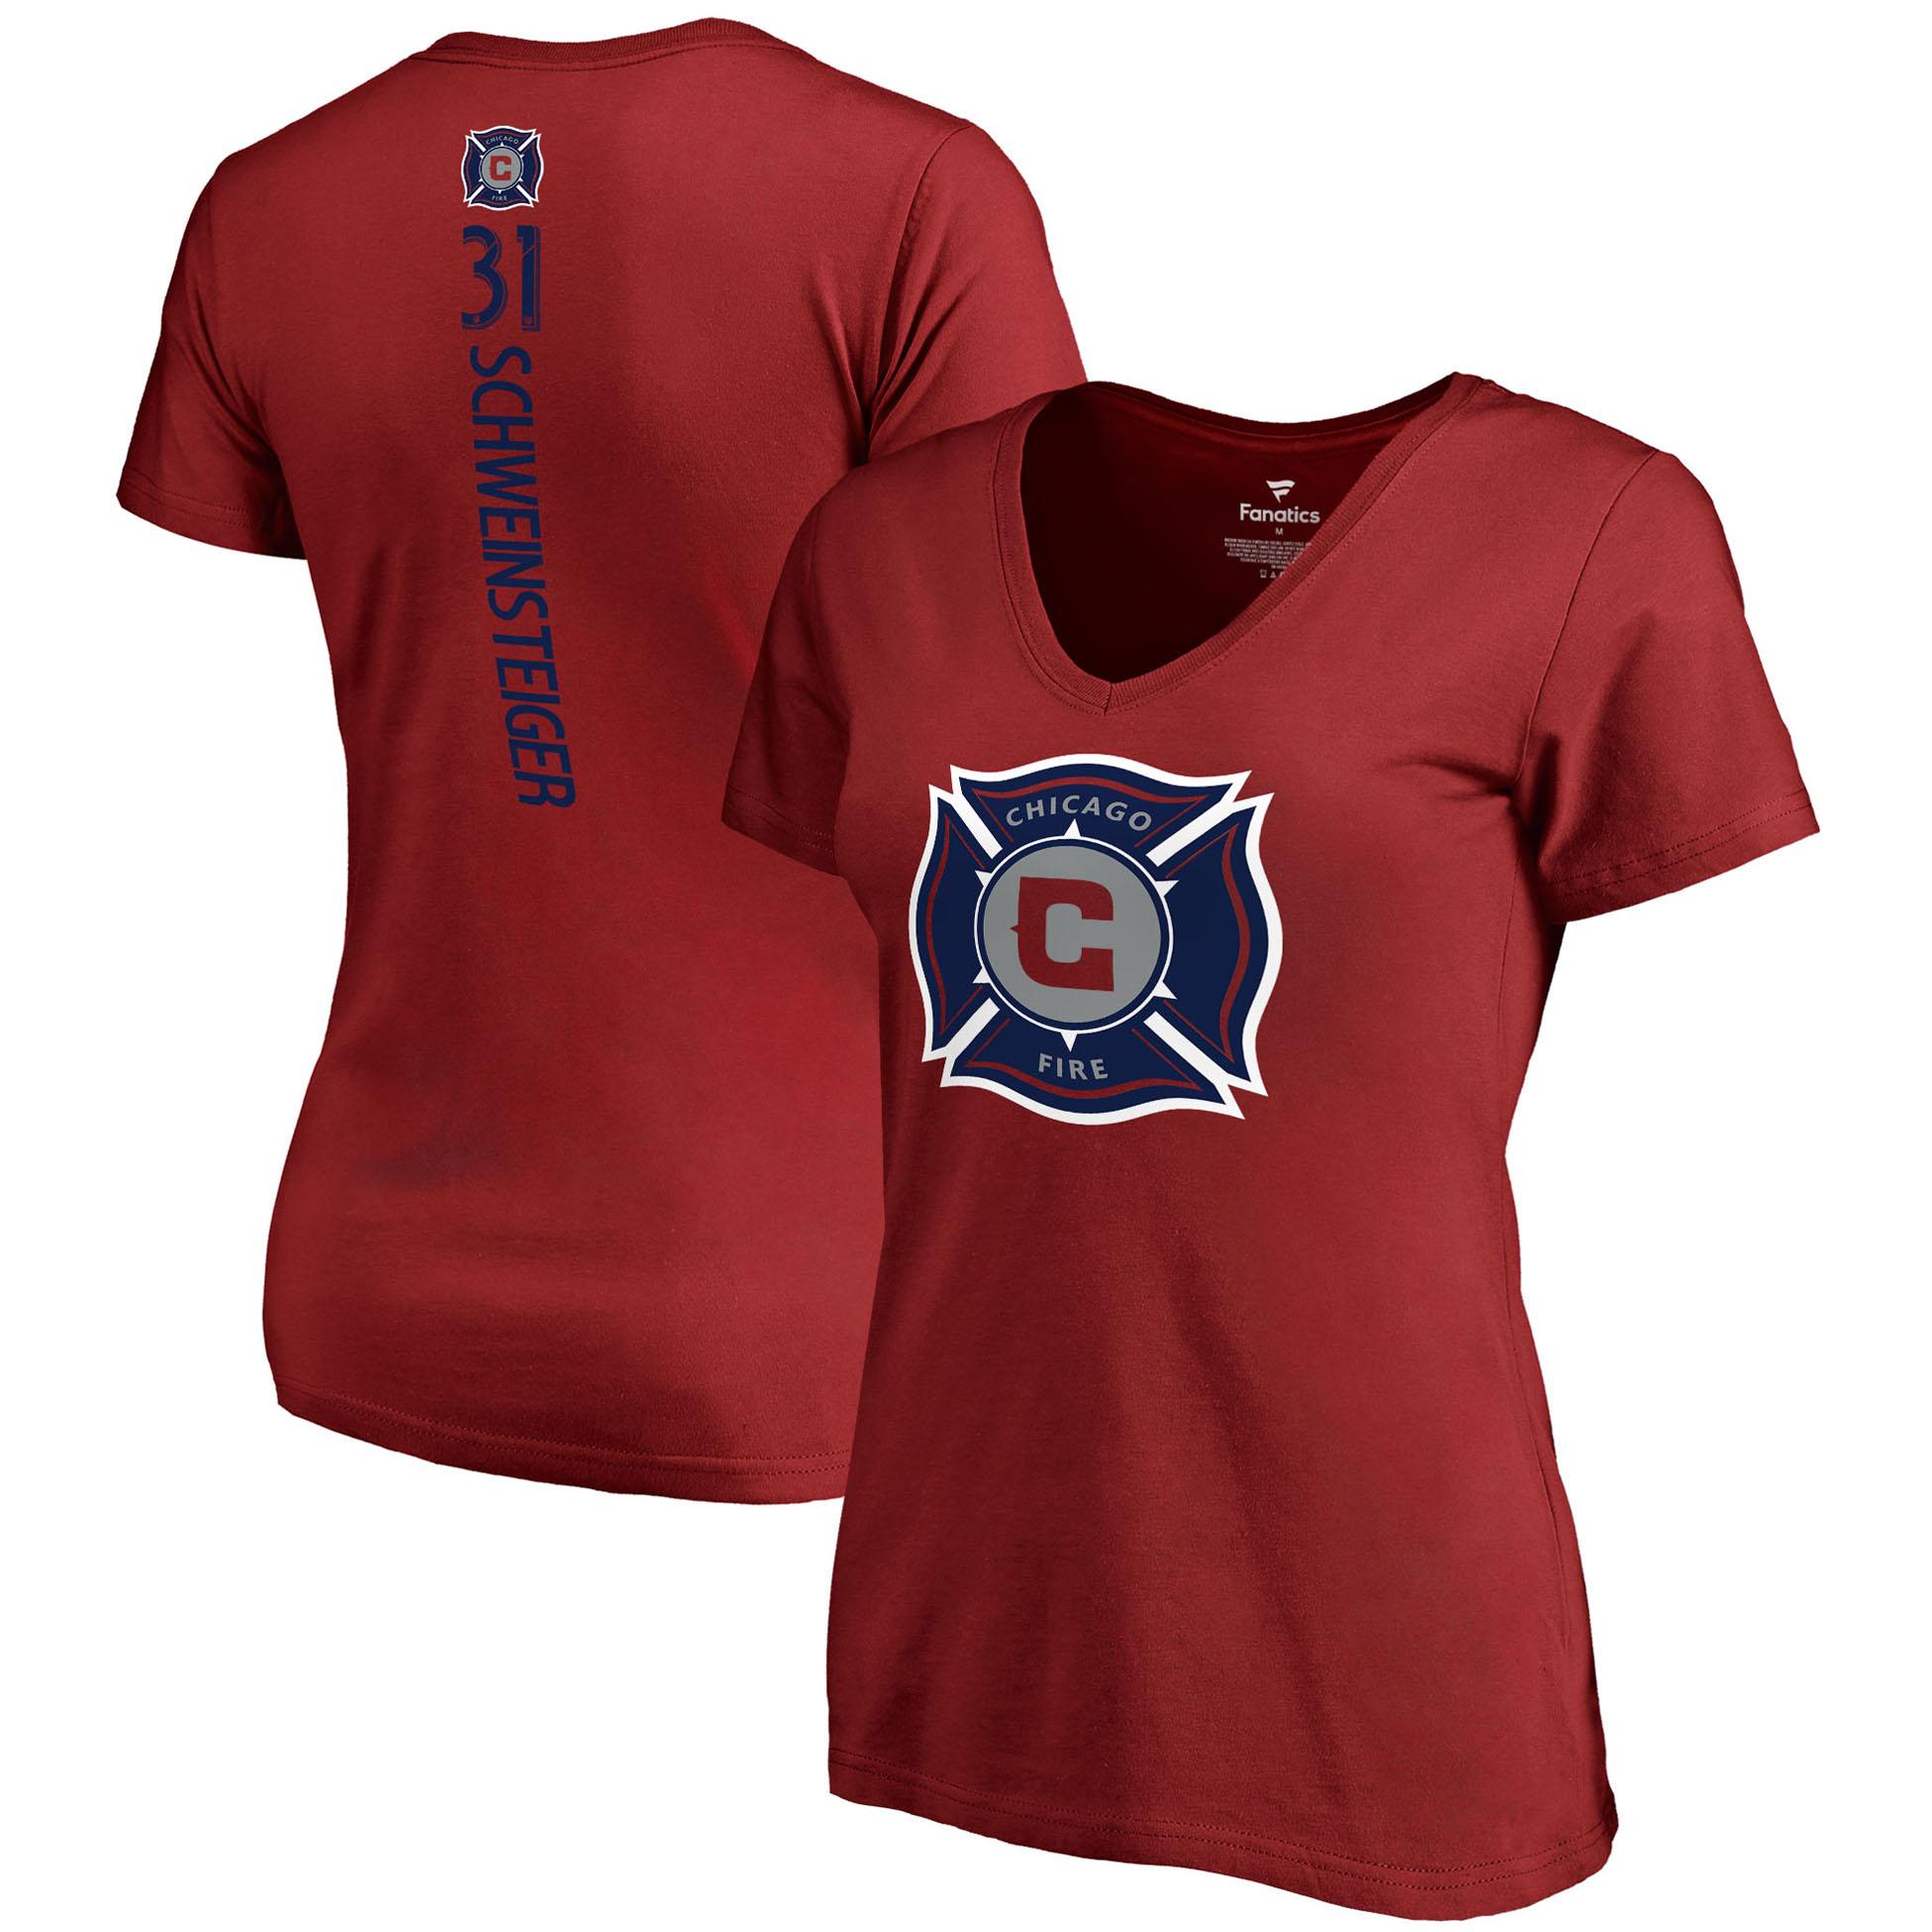 Bastian Schweinsteiger Chicago Fire Fanatics Branded Women's Backer Name & Number V-Neck T-Shirt - Red